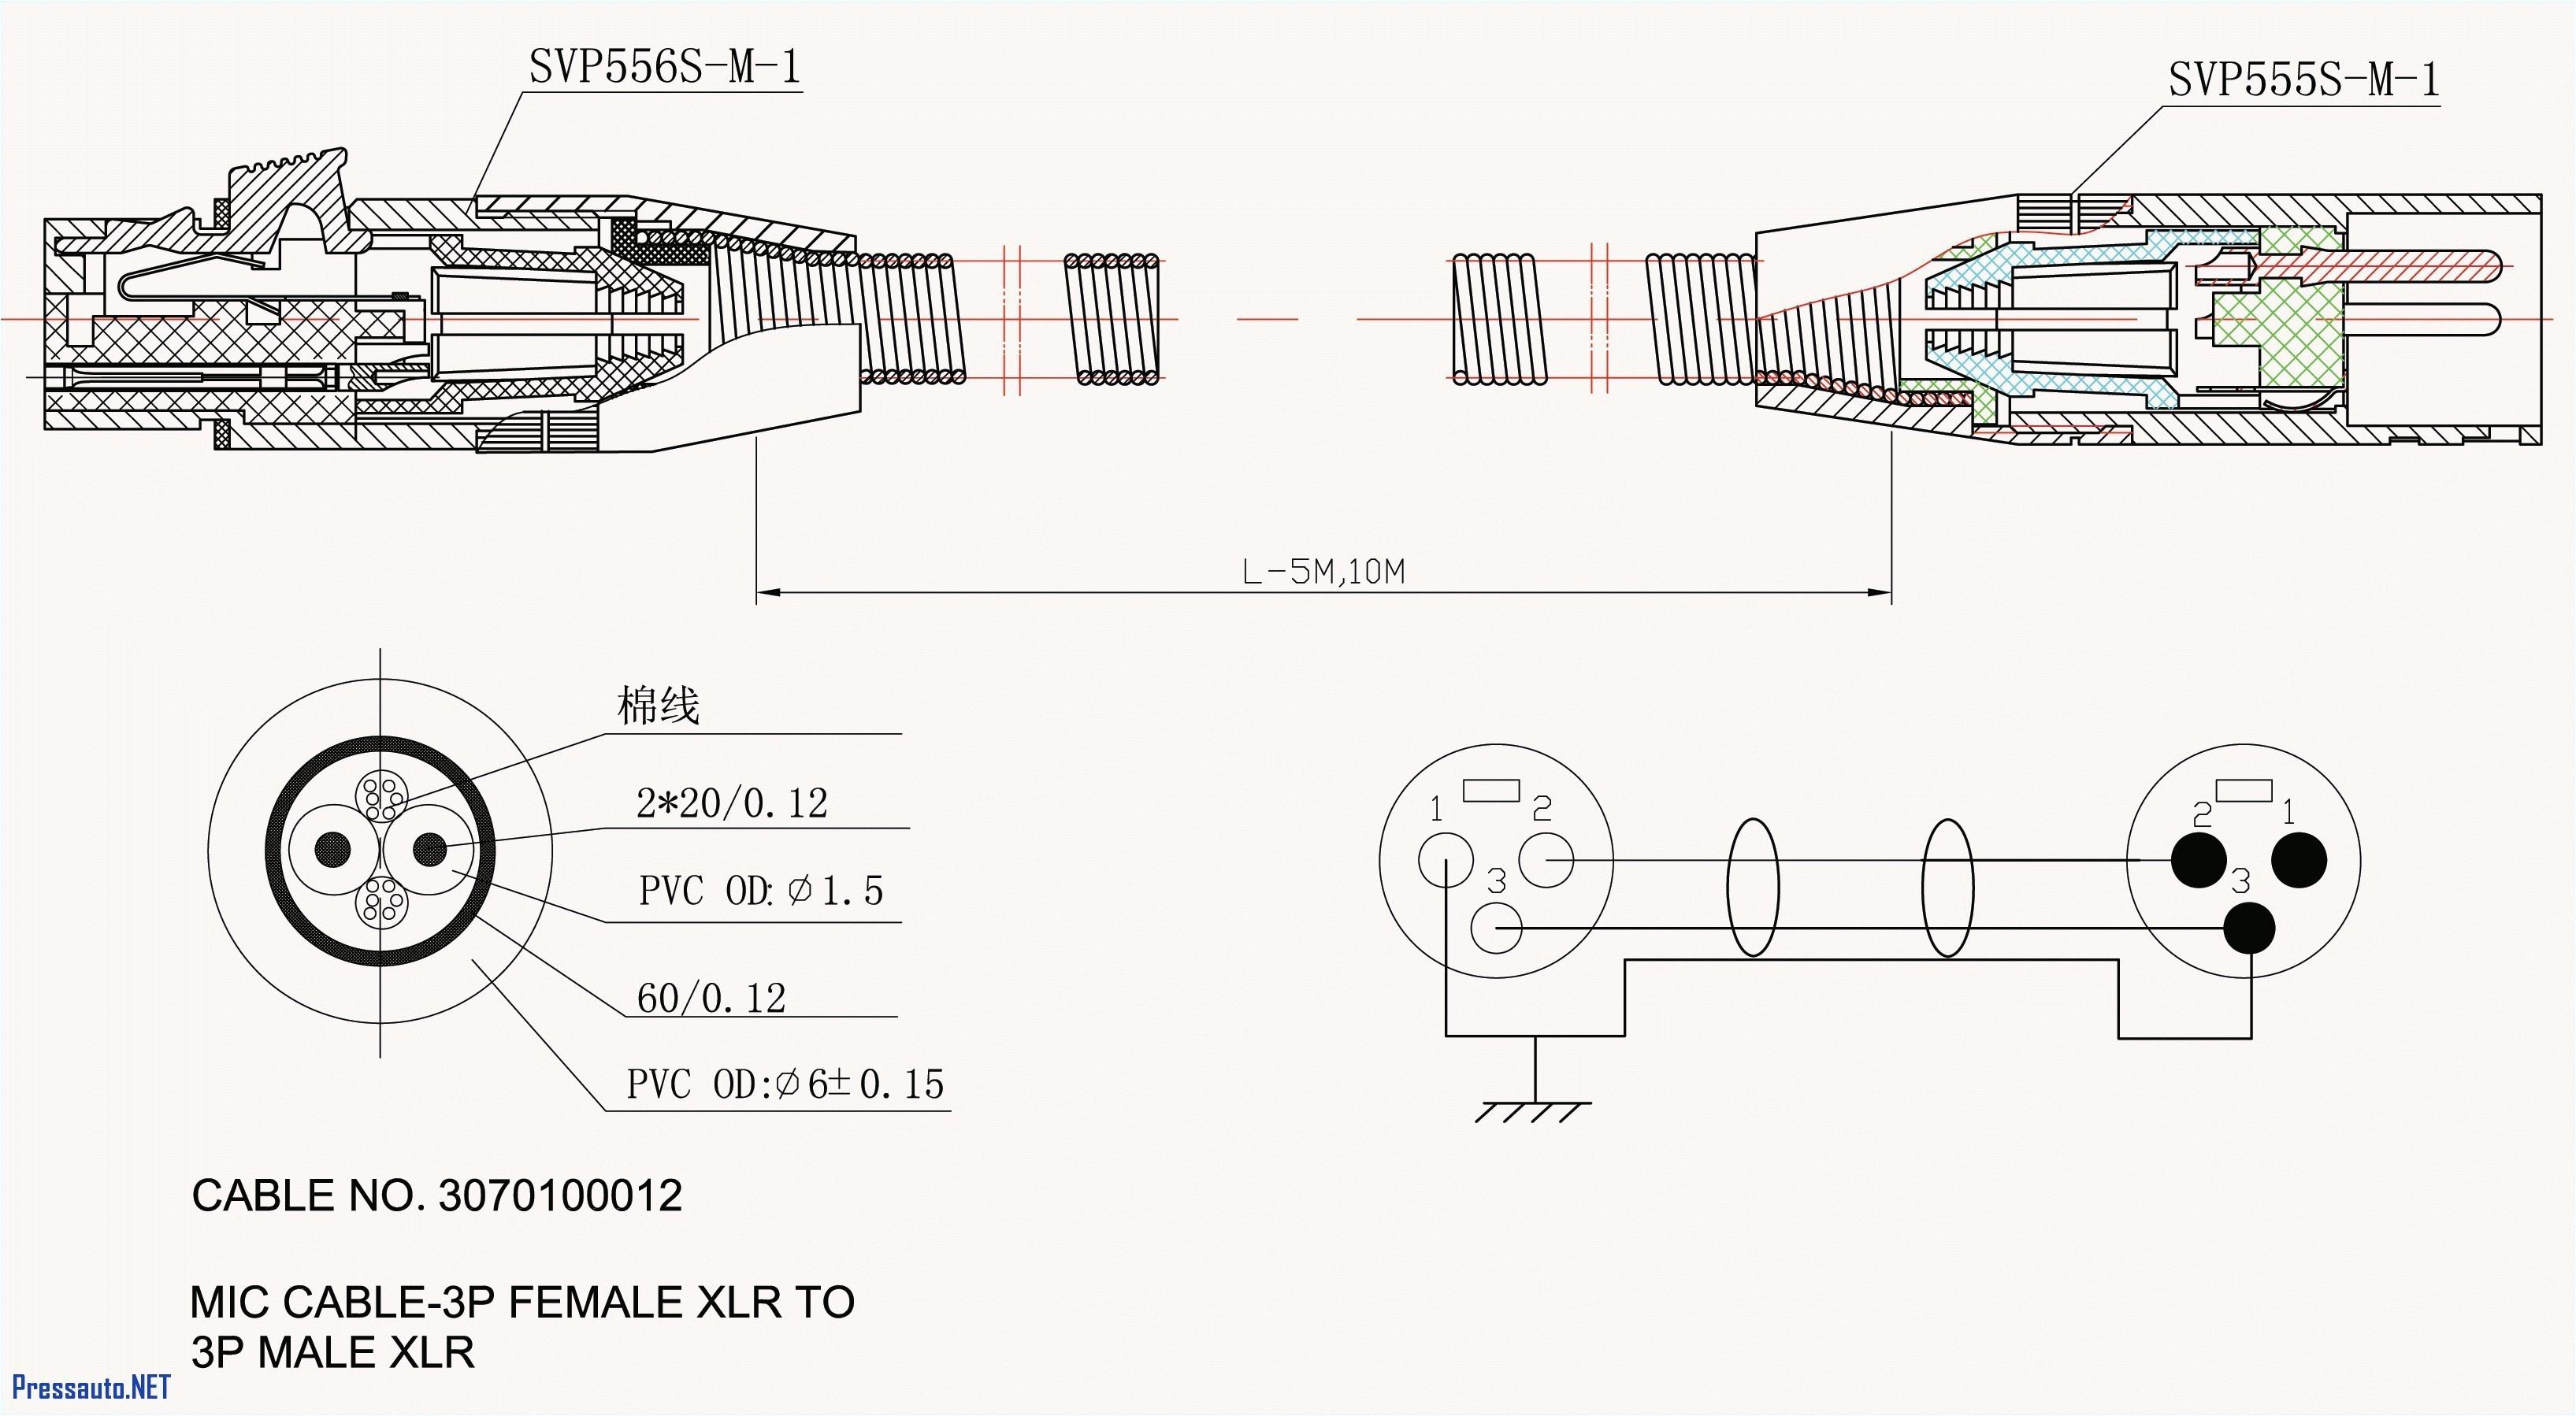 golf cart wiring diagram new club car wiring schematics a reveolution wiring diagram e280a2 collection of golf cart wiring diagram jpg